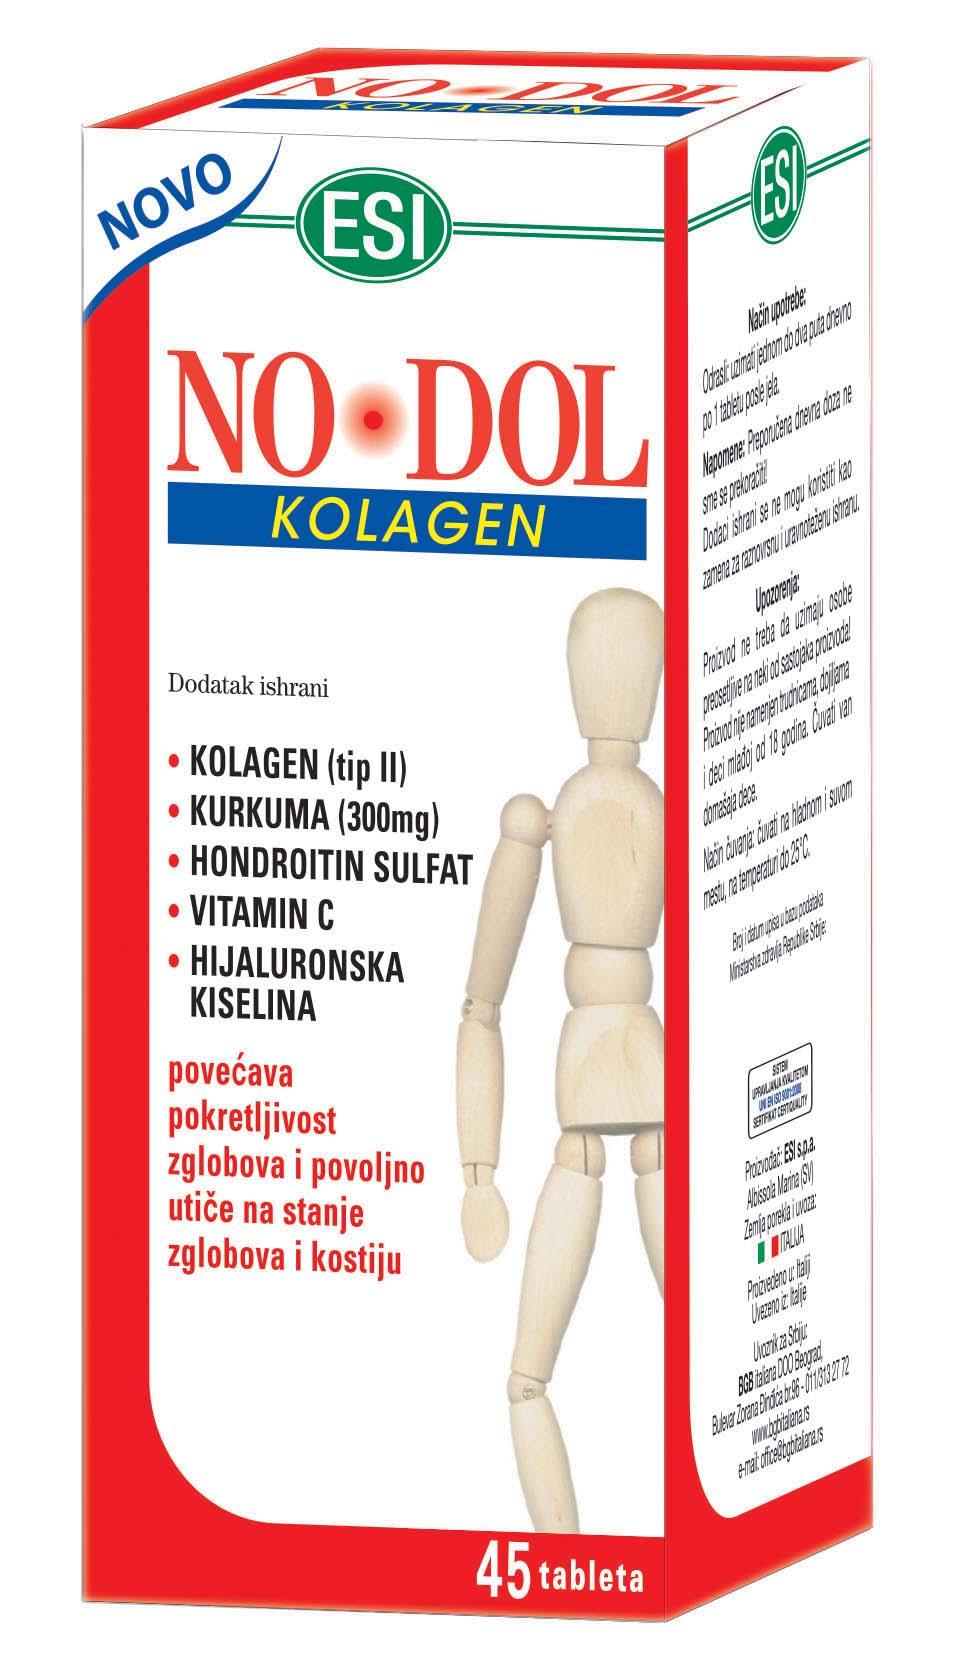 NO DOL KOLAGEN 45 tableta